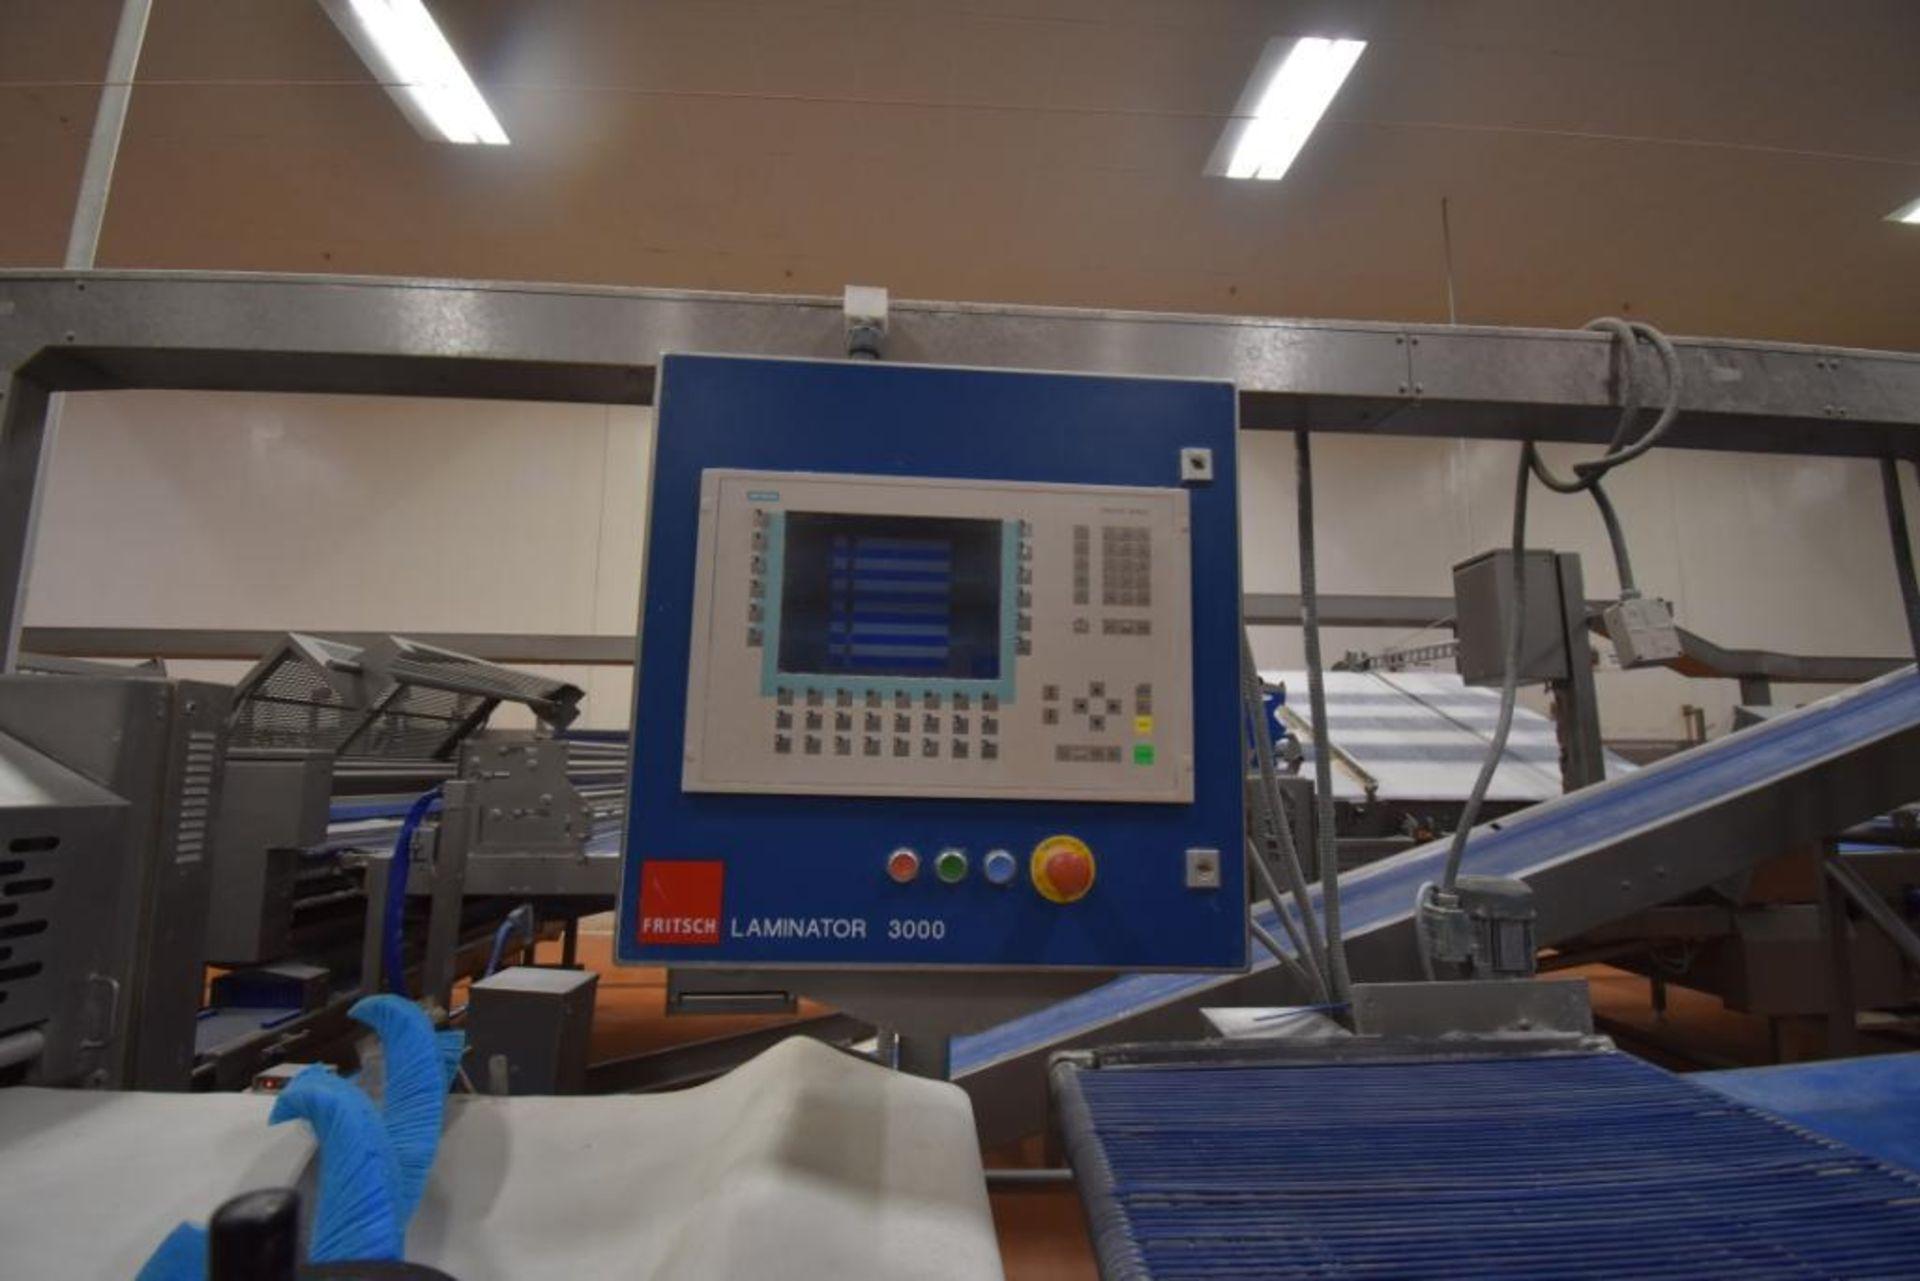 2007 Fritsch Laminator 3000 dough line - Image 84 of 280